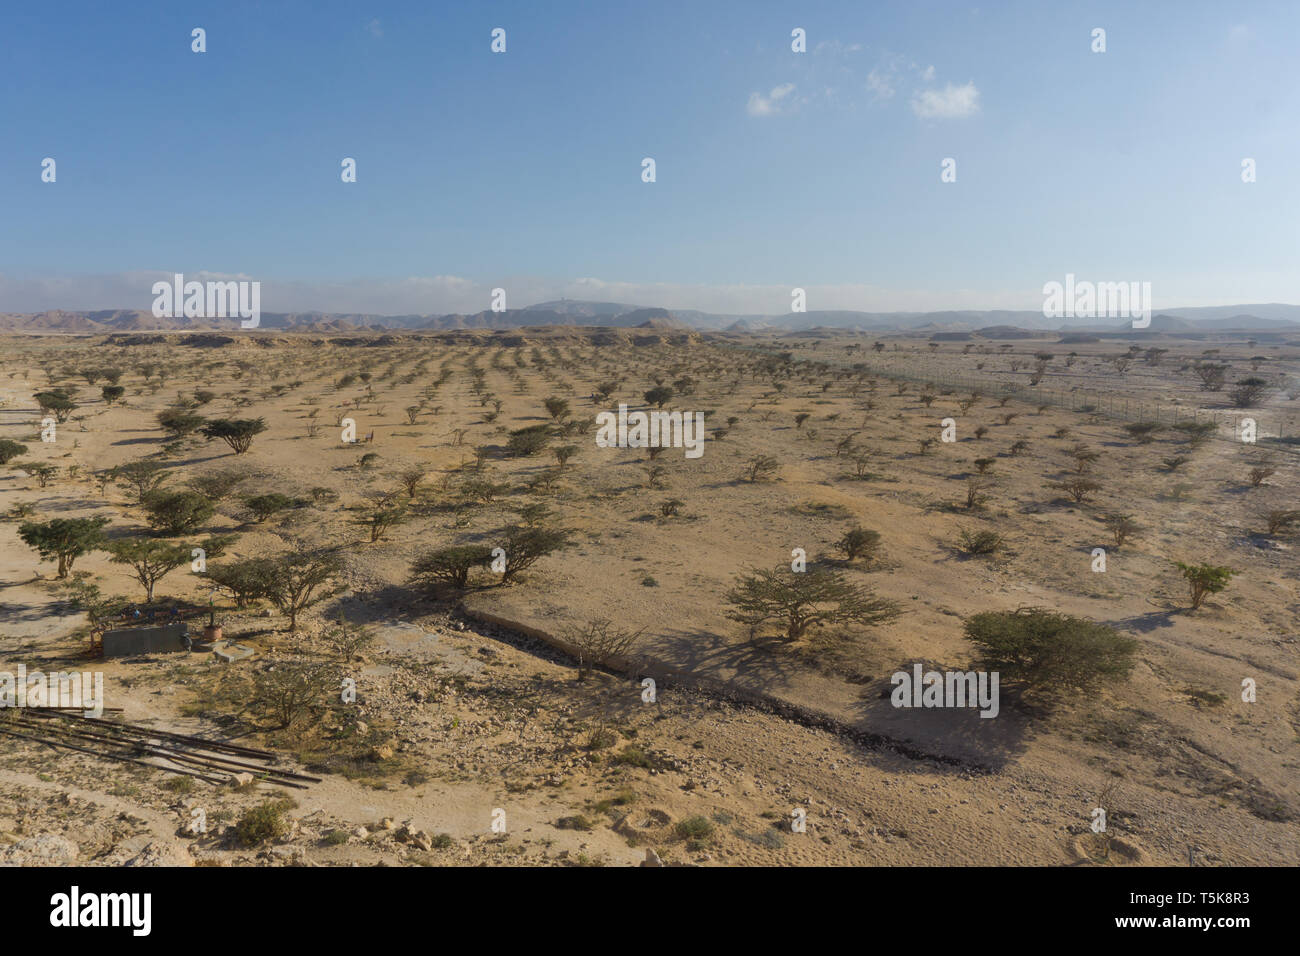 Frankincense trees, Salalah, Dhorfar, Oman Stock Photo